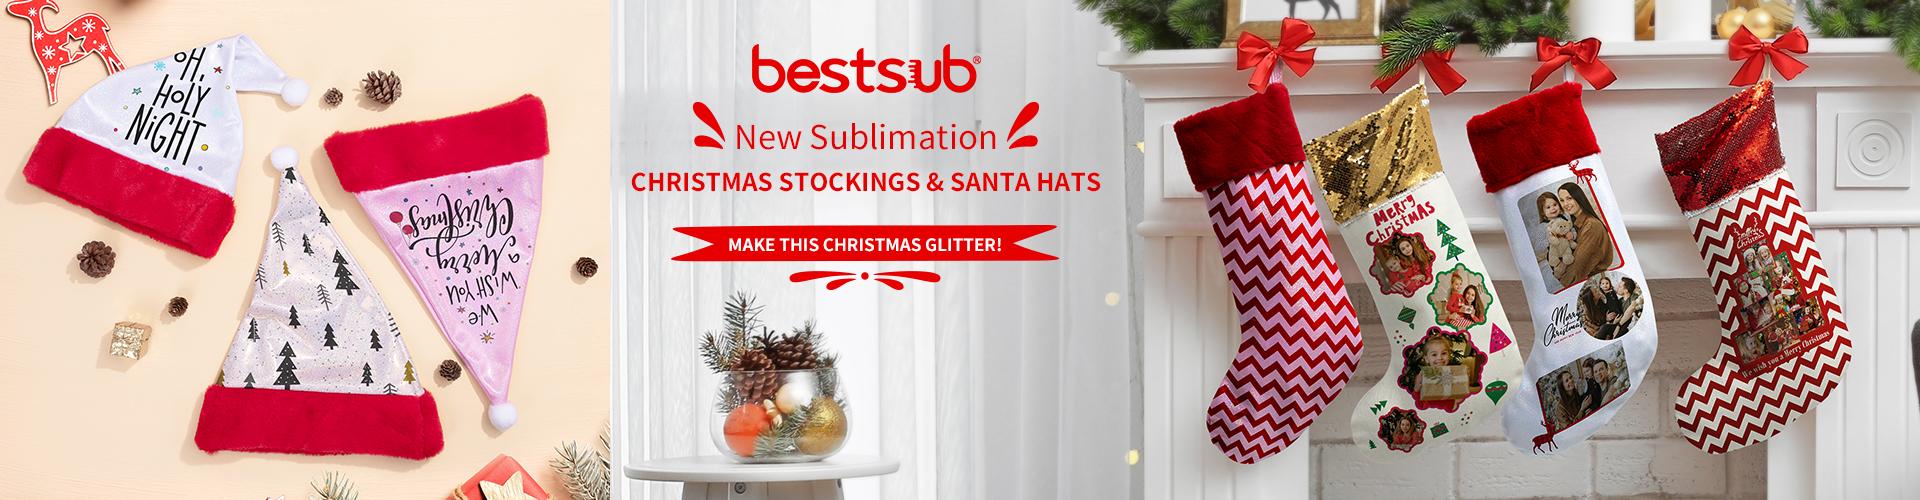 2021-09-22_New_Sublimation_Christmas_Stockings_Santa_Hats_new_web